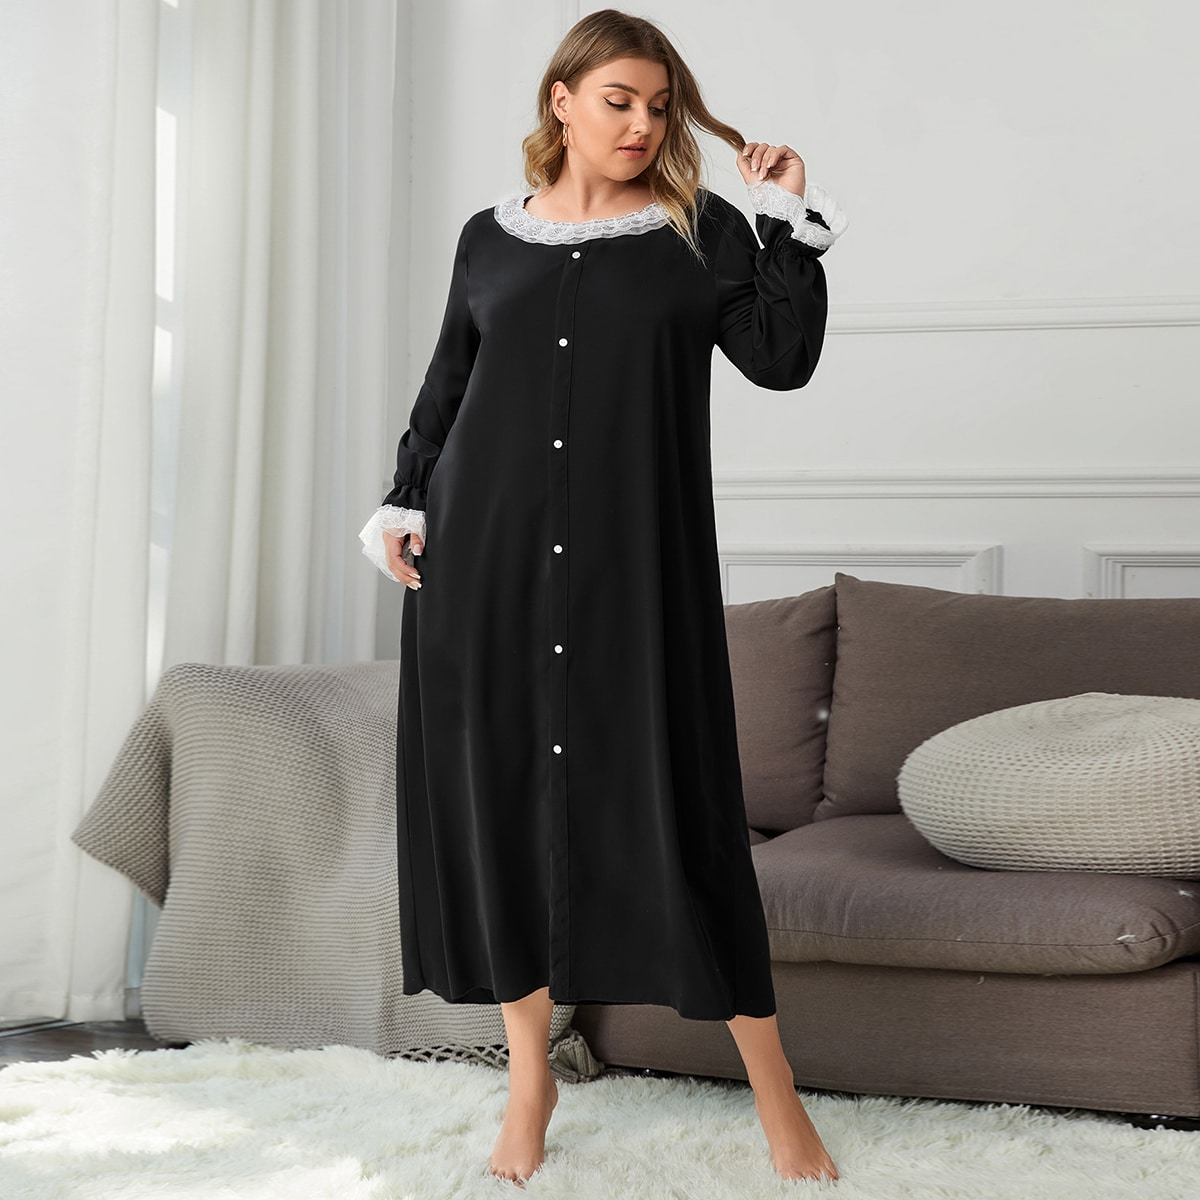 SHEIN / Plus Contrast Lace Flounce Sleeve Night Dress